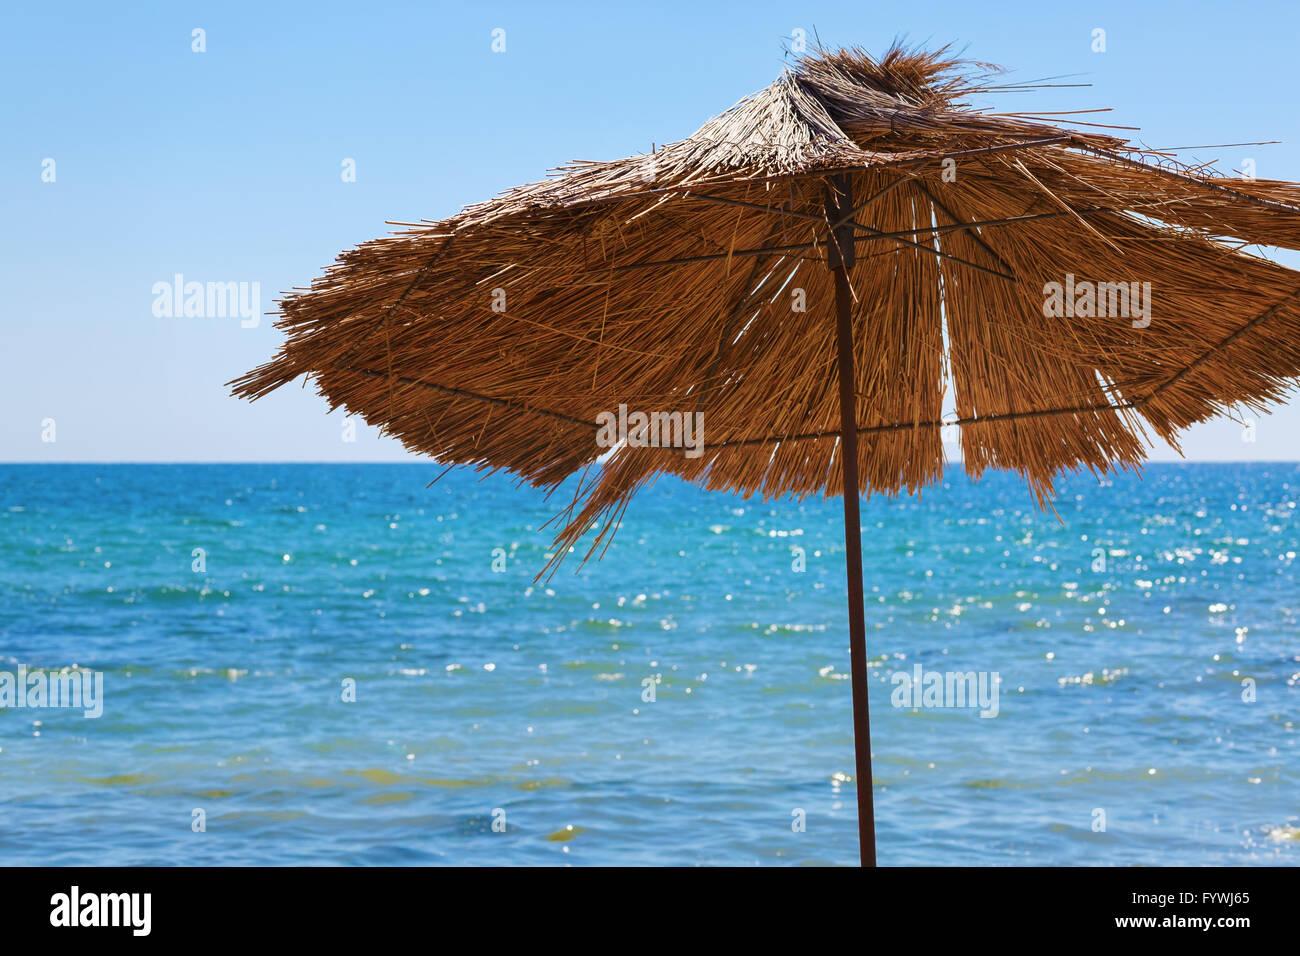 Straw umbrella - Stock Image